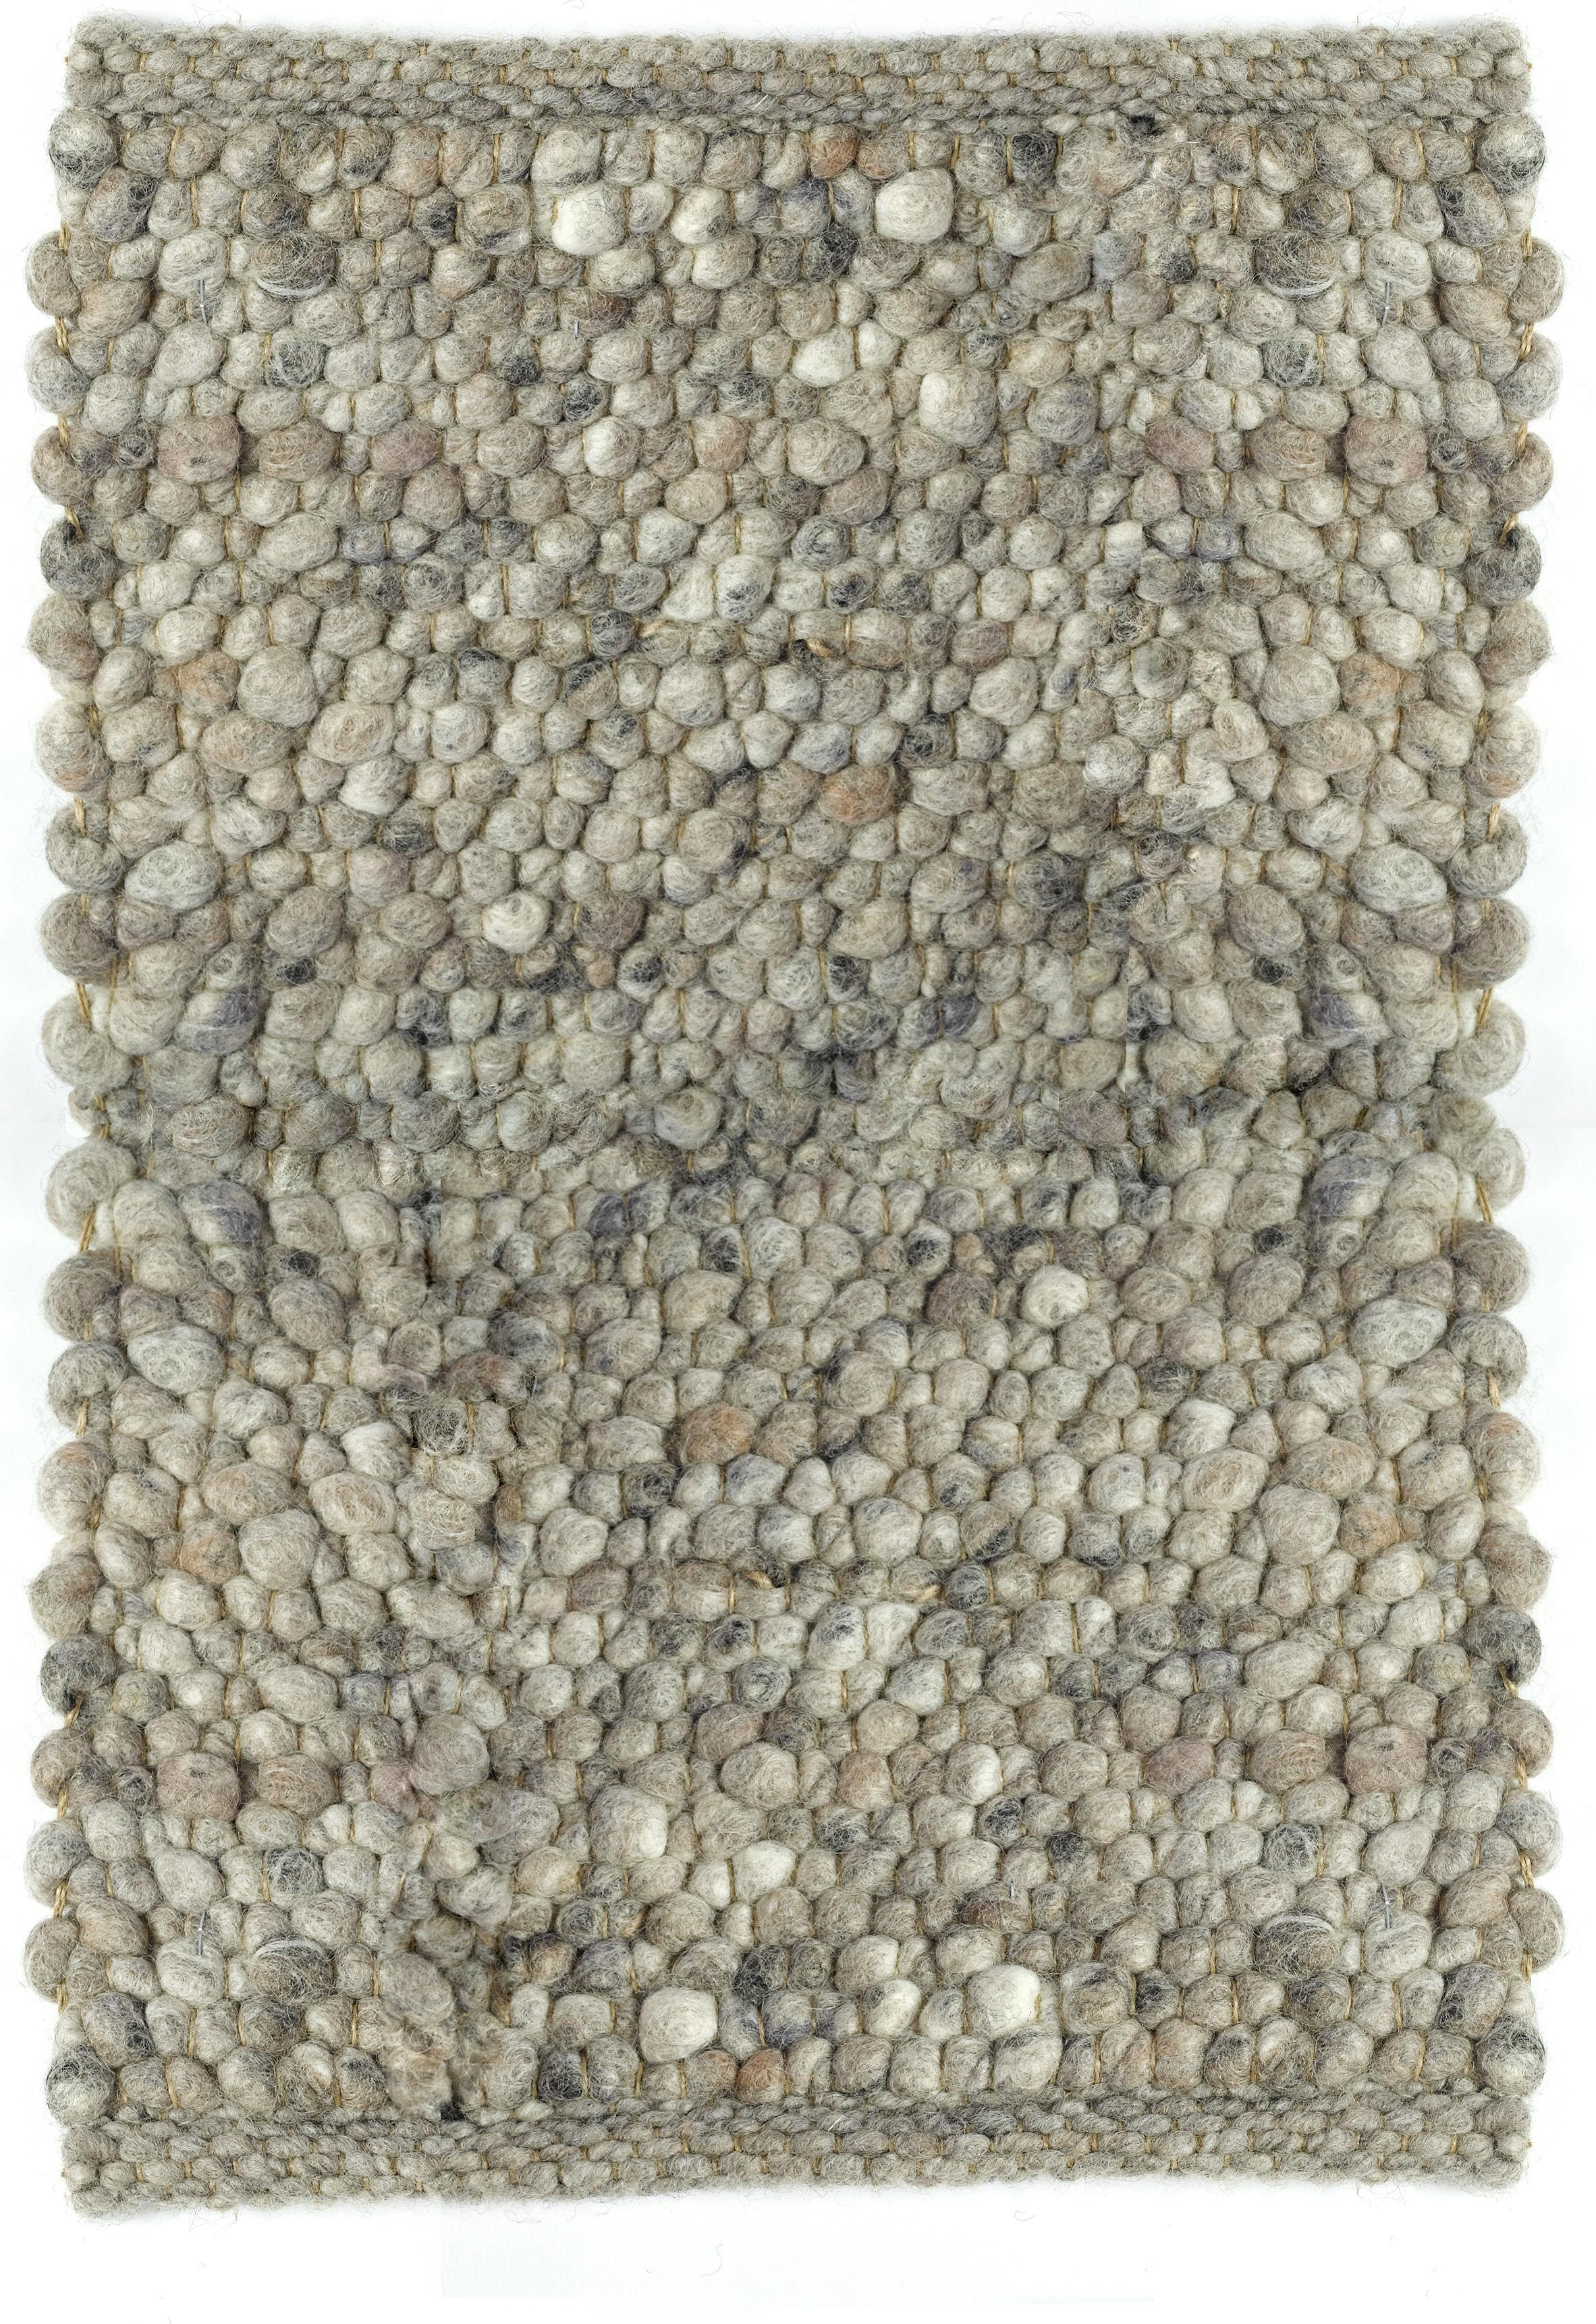 carpet pebbles 200 x 240 cm pols potten teppich. Black Bedroom Furniture Sets. Home Design Ideas